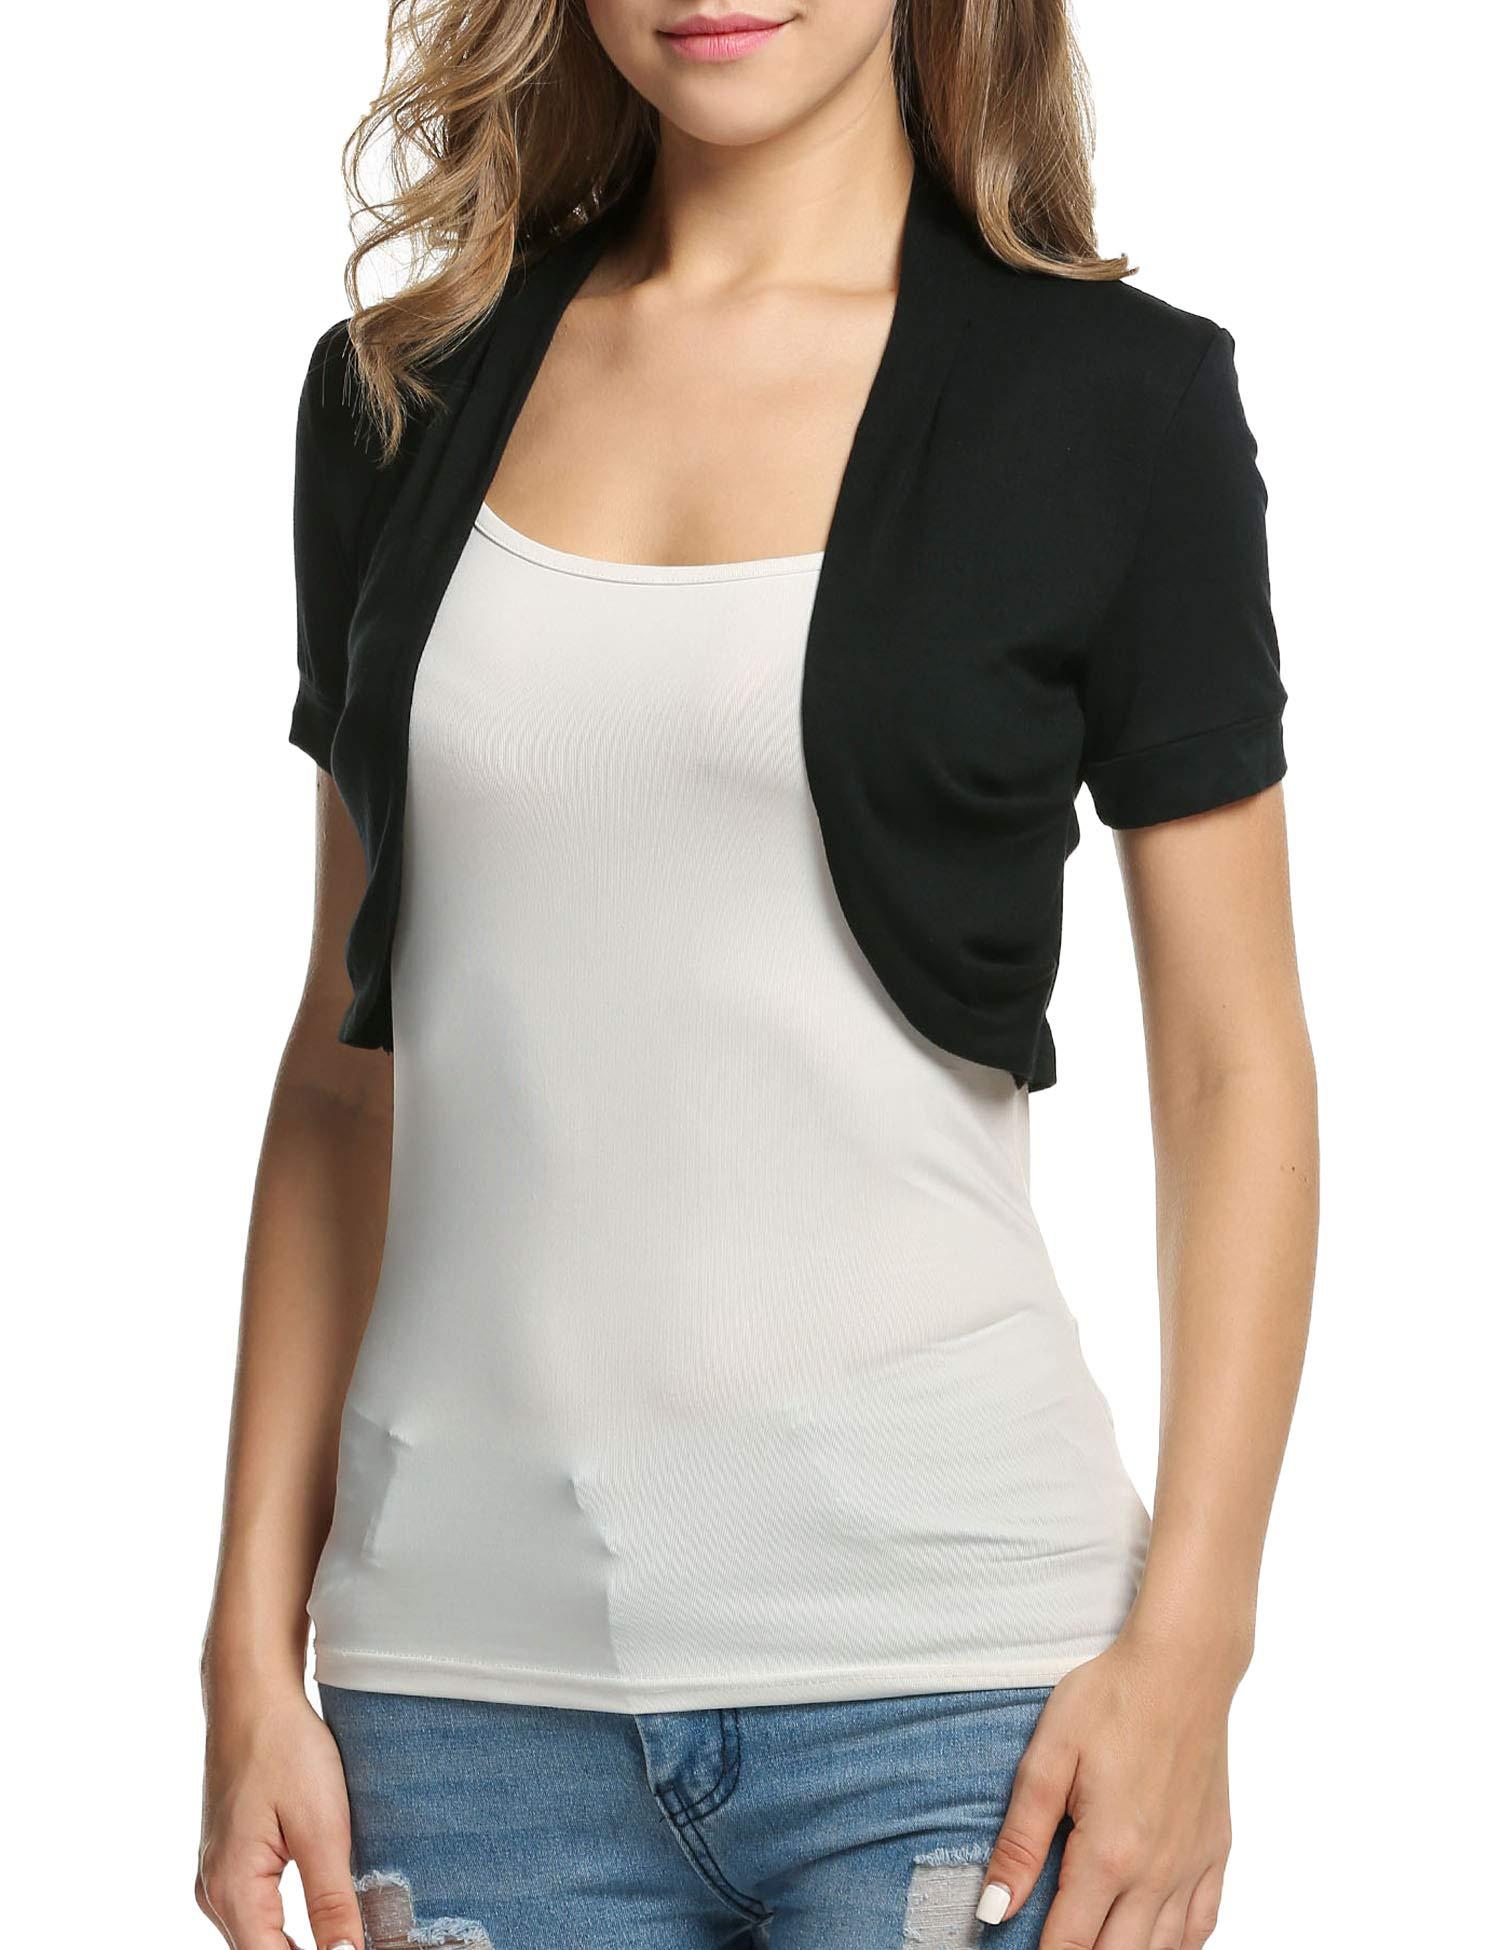 3f20f88463 BEAUTYTALK Women s Short Sleeve Shrug Open Front Casual Cardigan Black  Bolero Jacket(Black